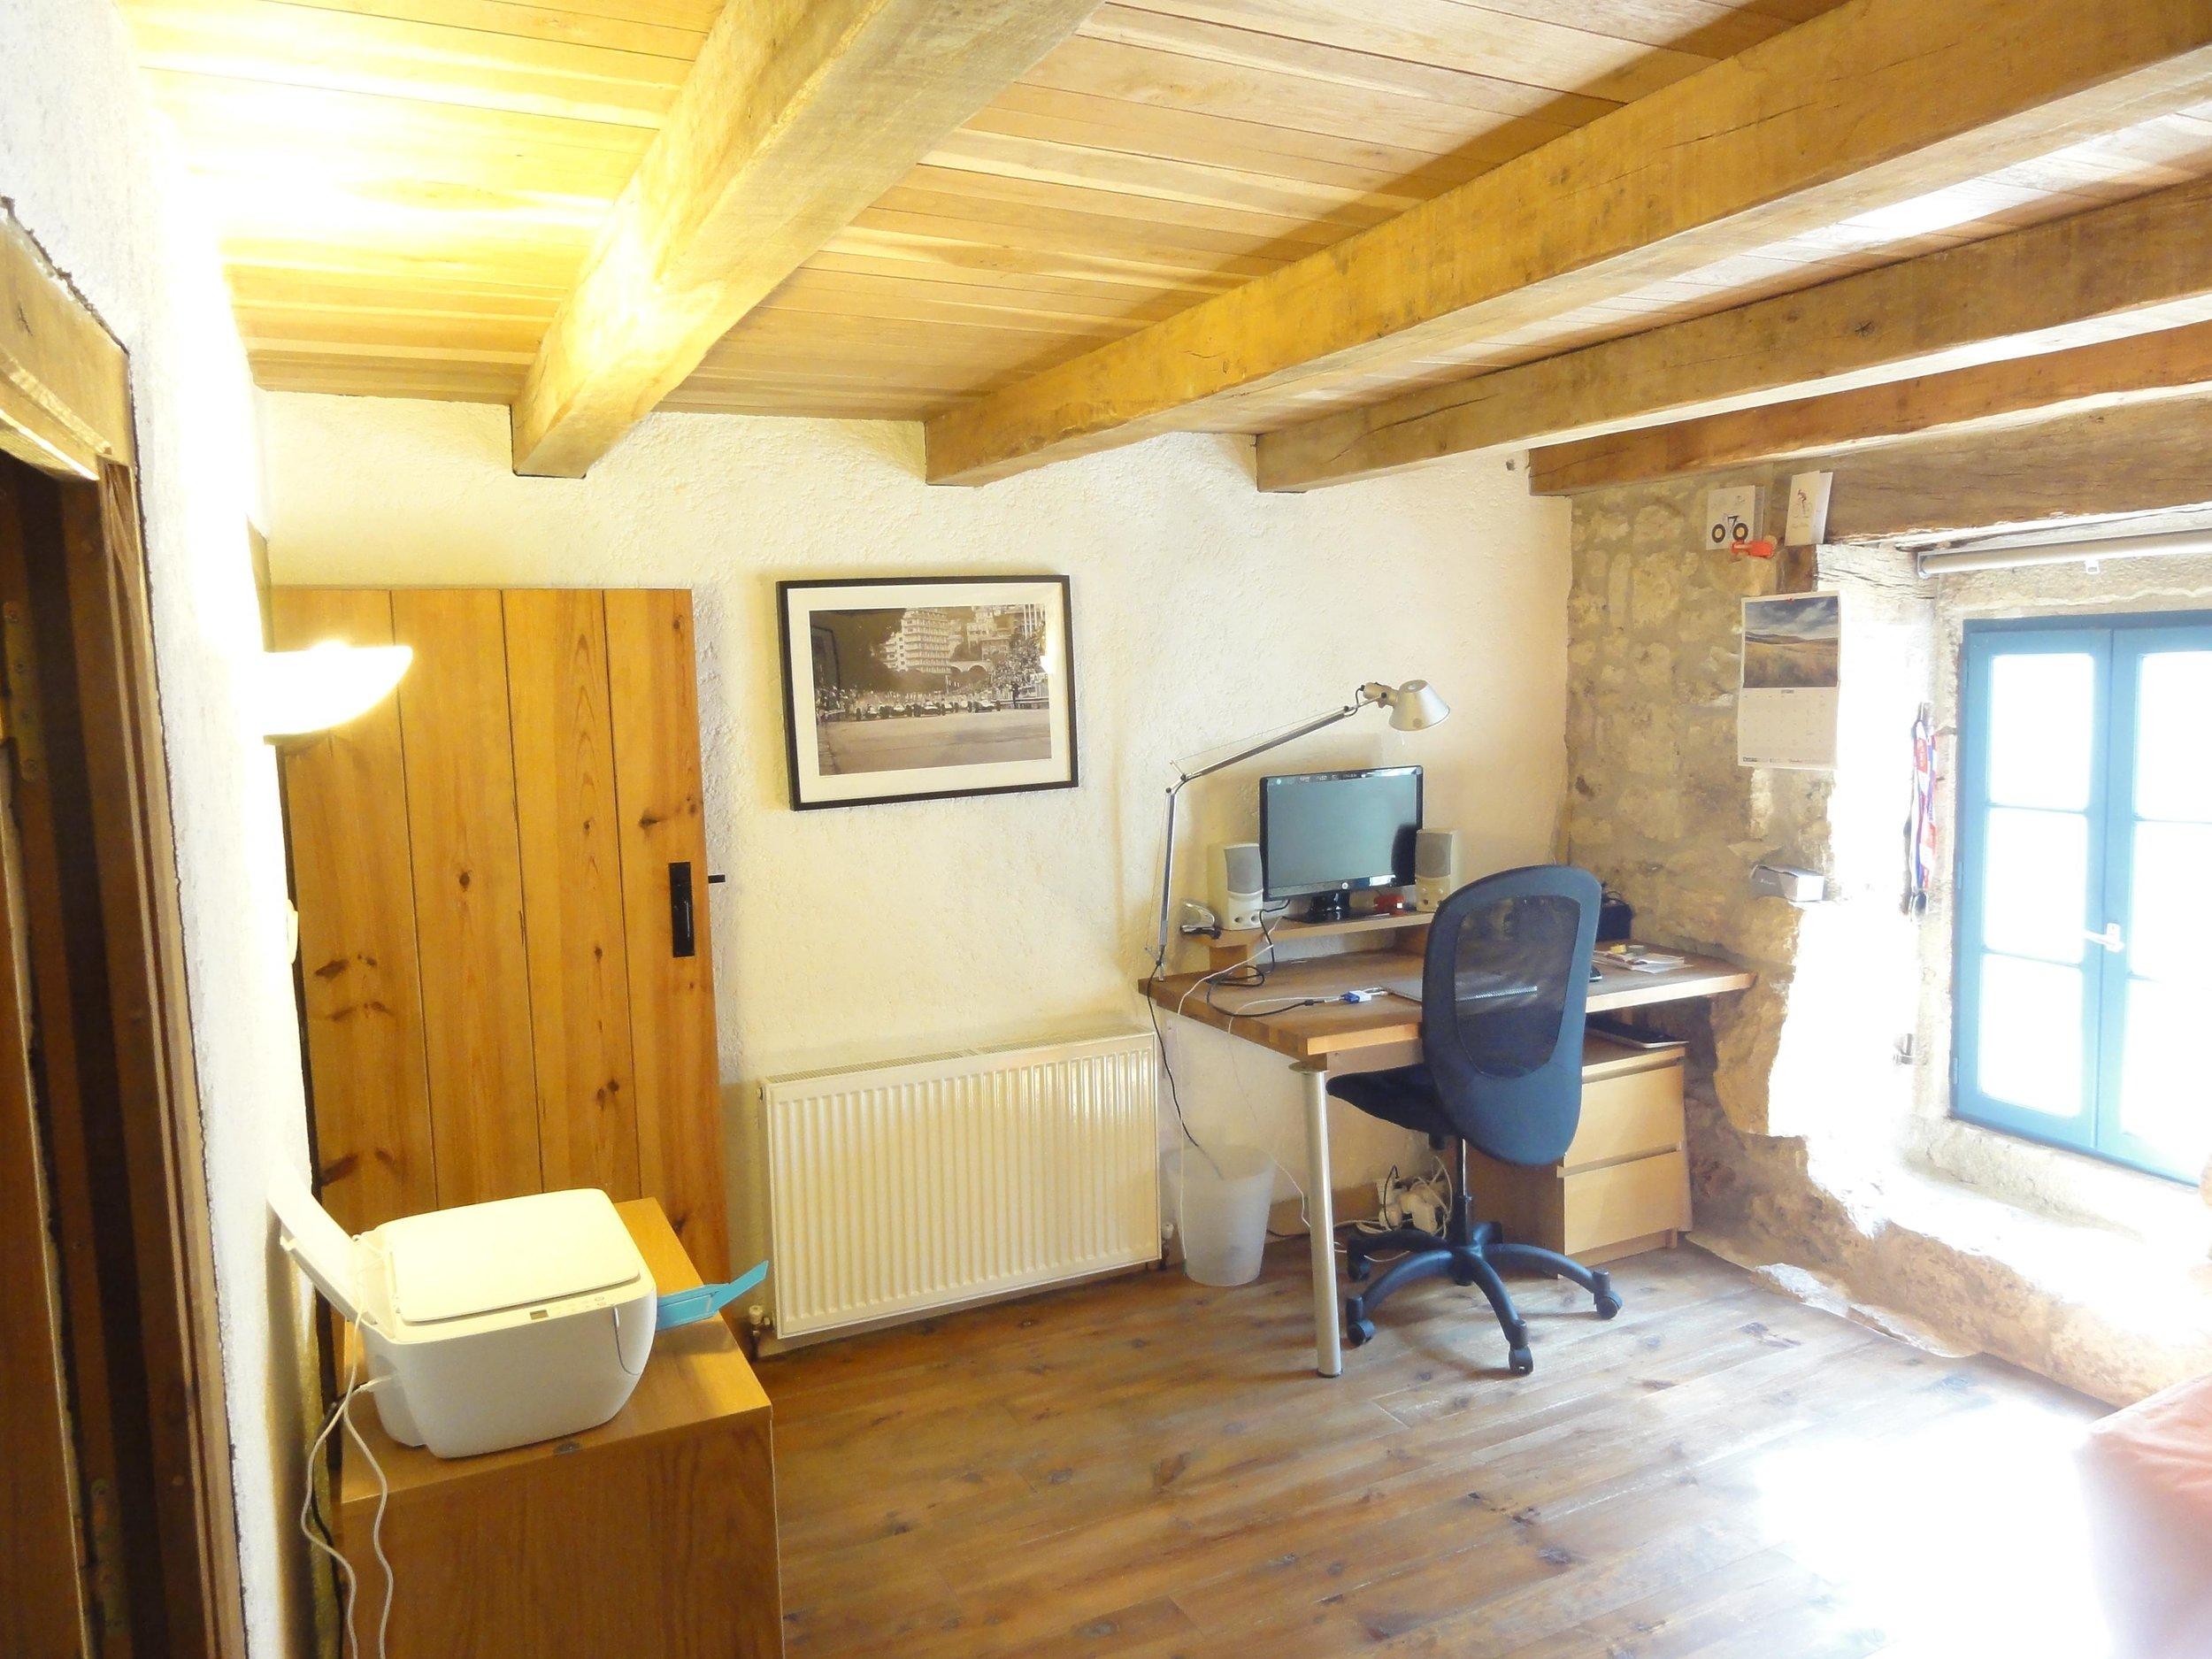 5 house study.jpg